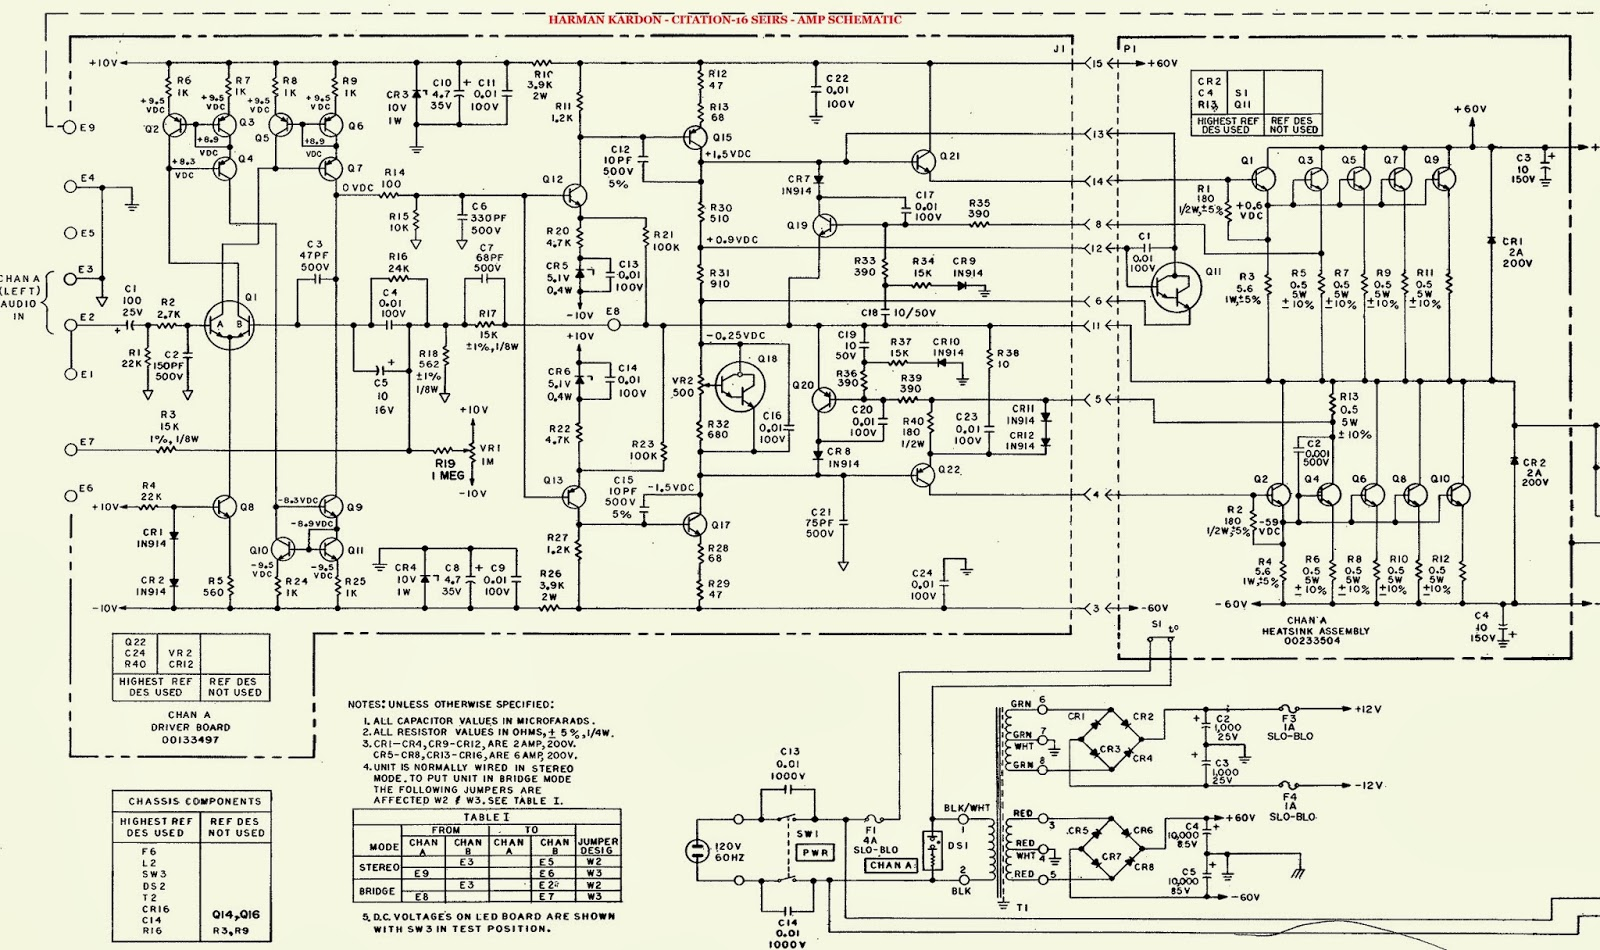 Electro Help  Harman-kardon - Citation-16 Series